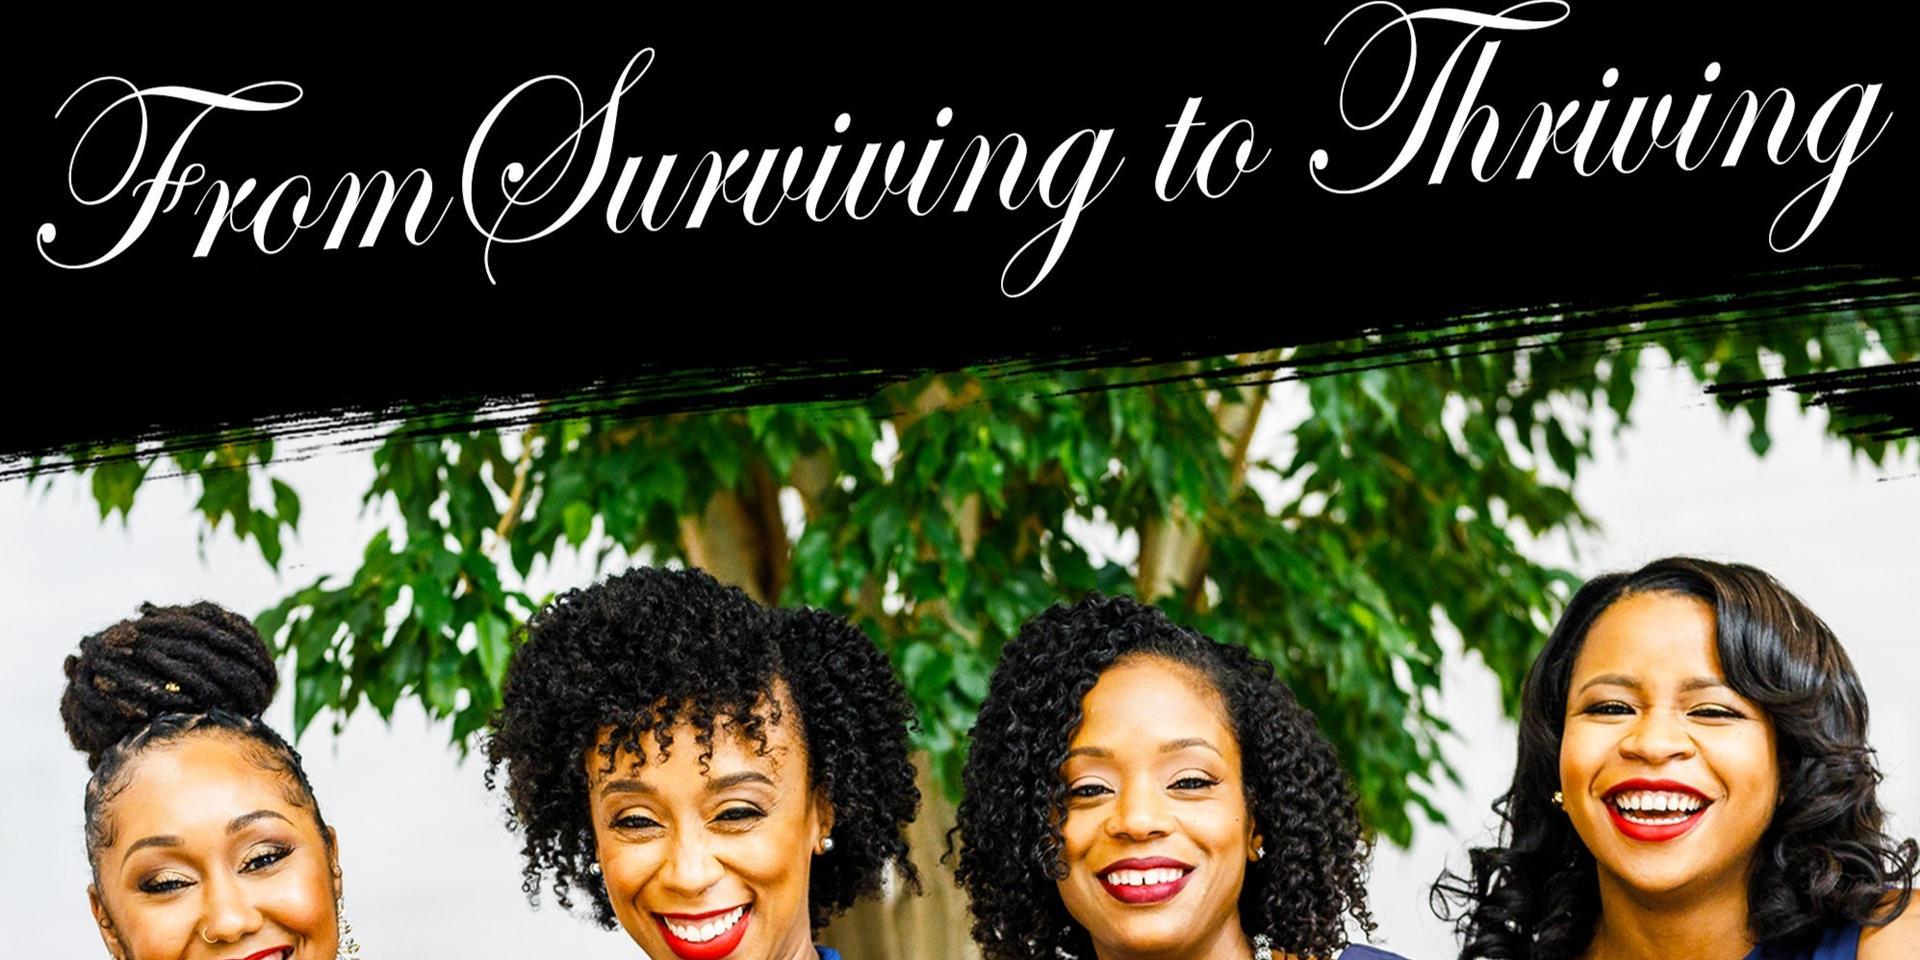 Surviving-to-Thriving5_edited_edited_edi